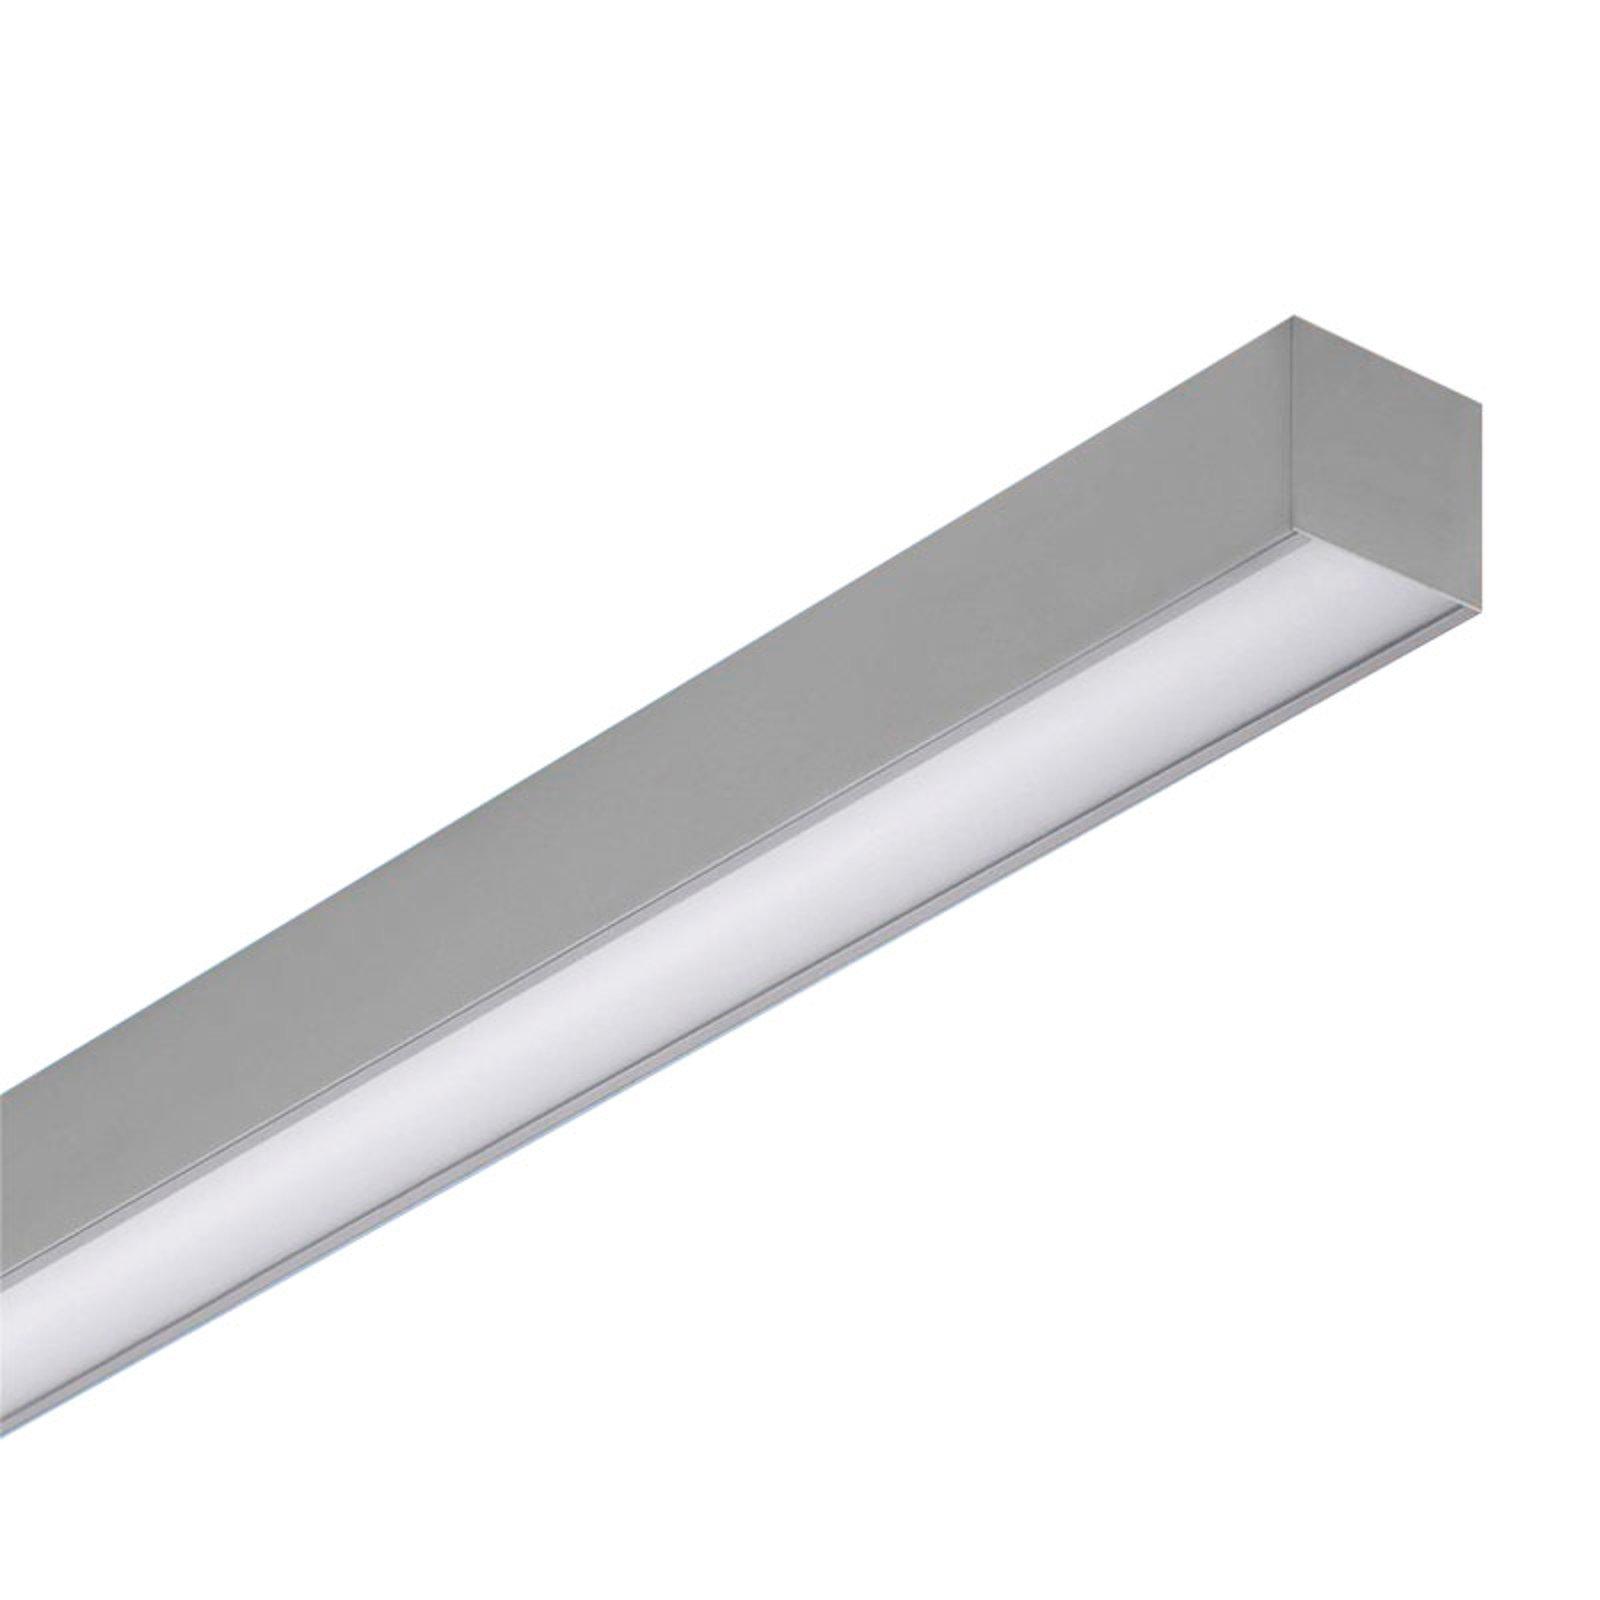 Effektiv LED-vegglampe LKPW075, 4 000K